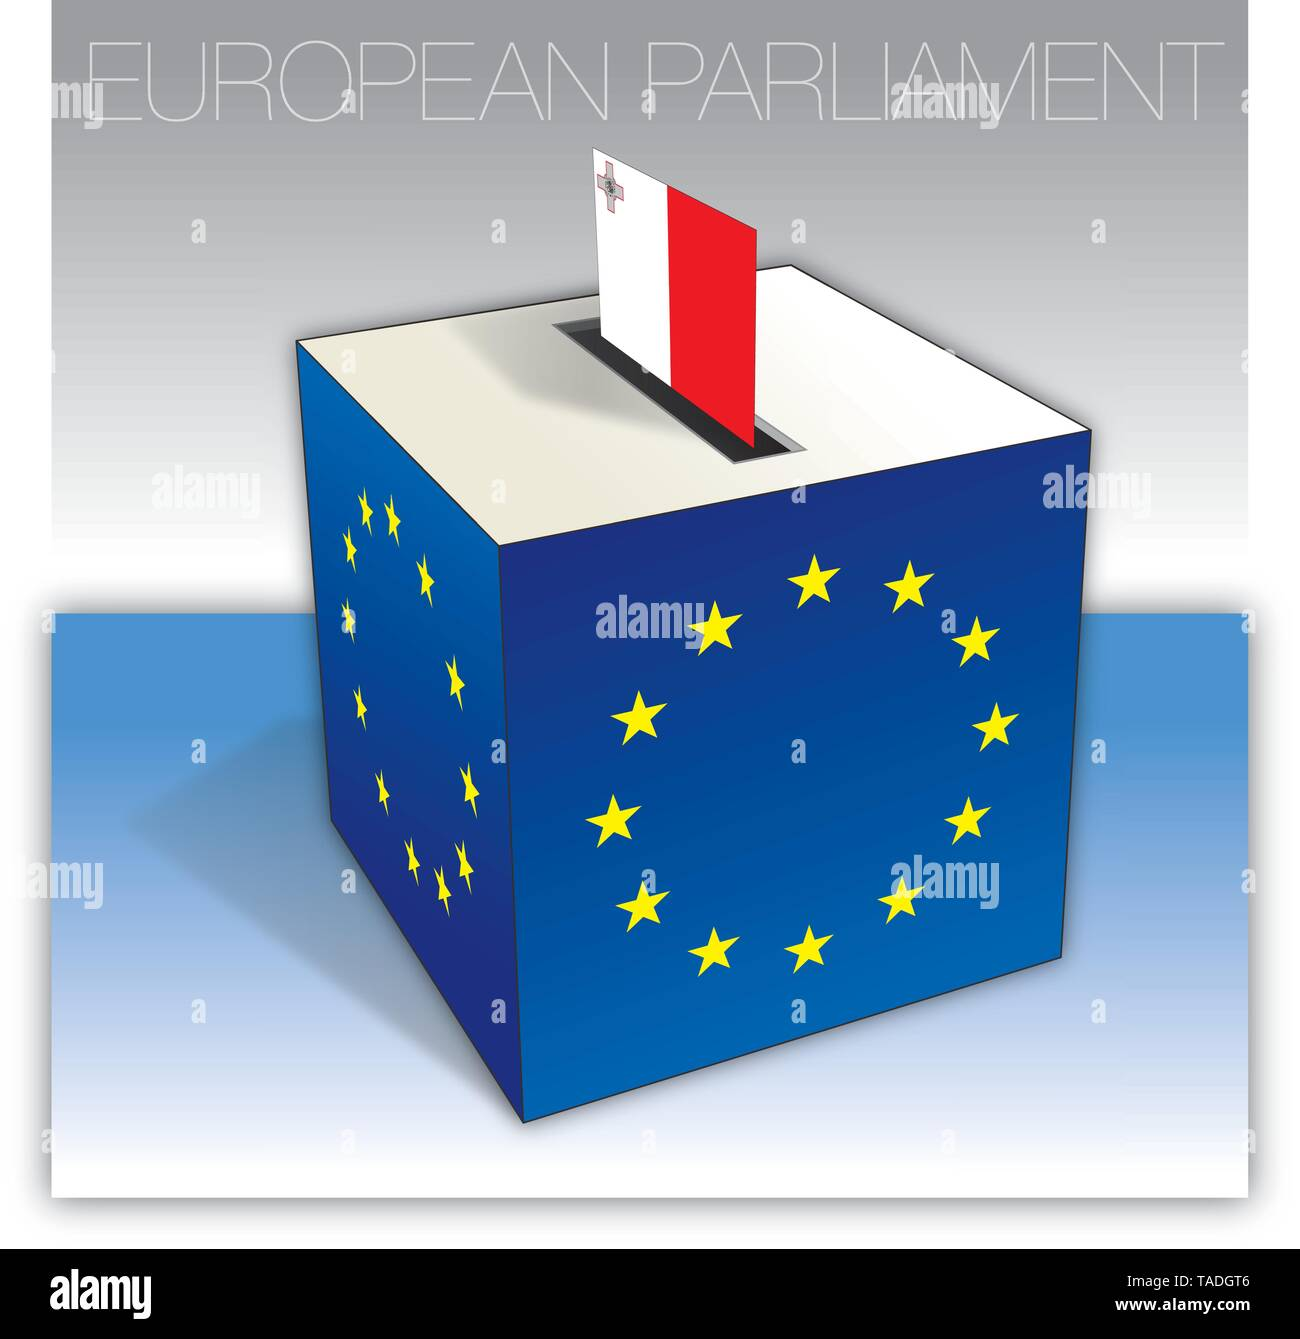 Malta voting box, European parliament elections, flag and national symbols, vector illustration - Stock Image